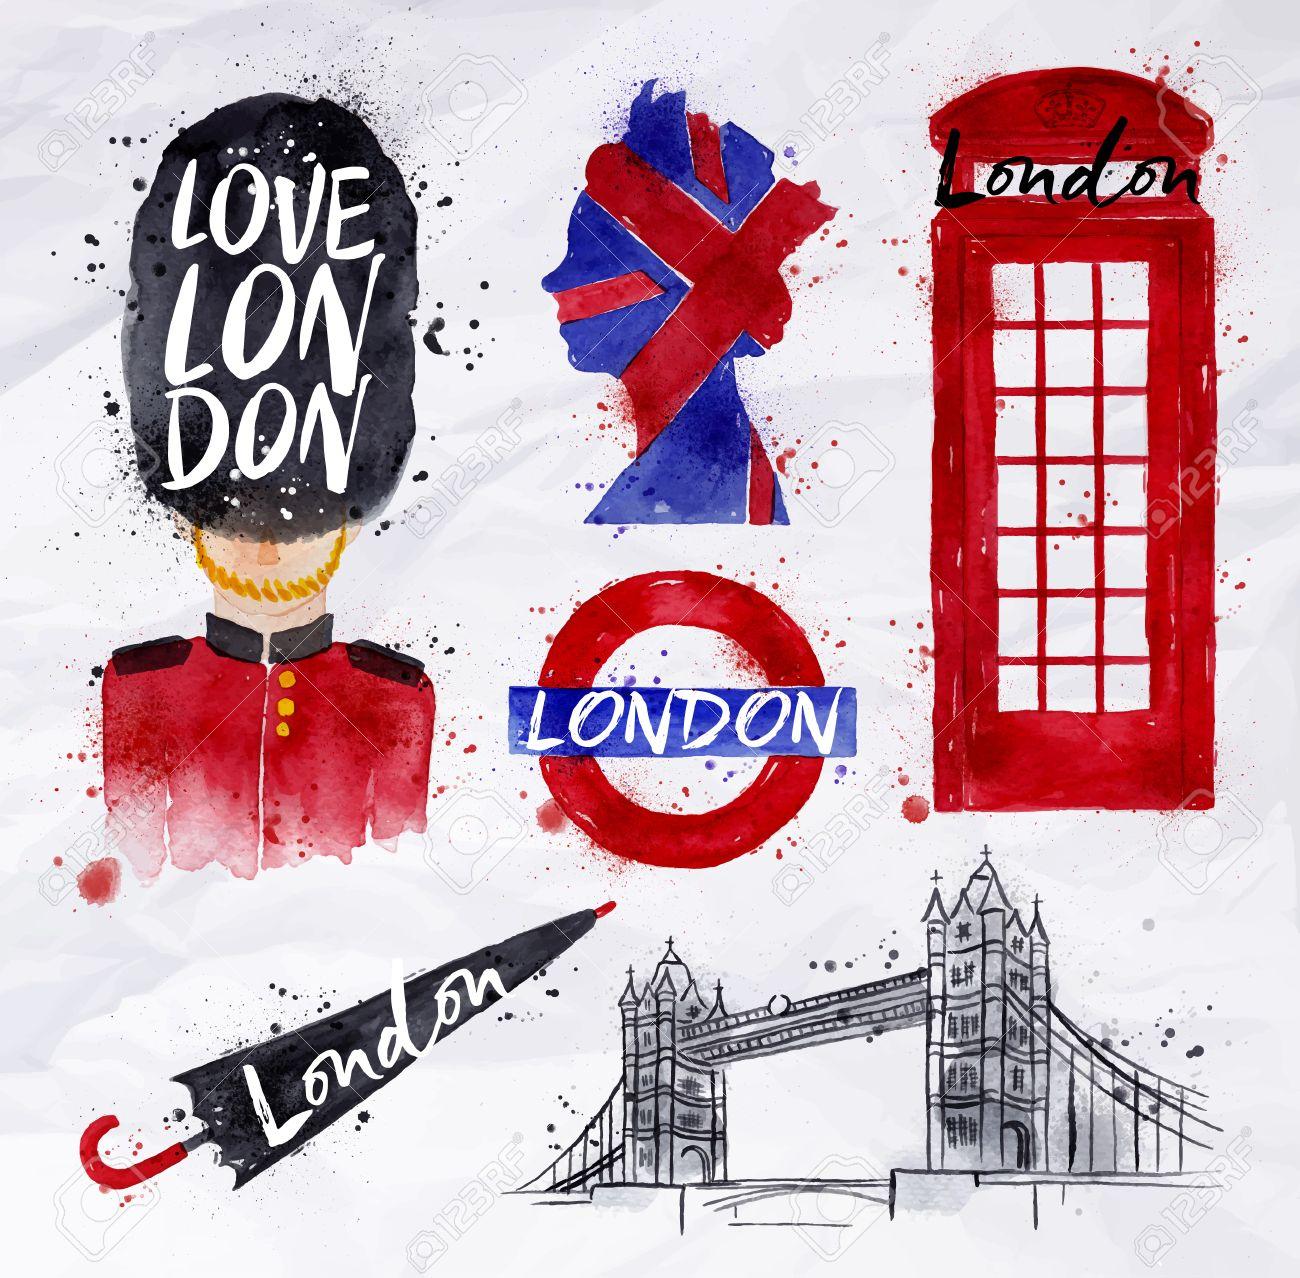 1300x1278 London Symbols Phone Booth, Umbrella, Underground, Tower Bridge